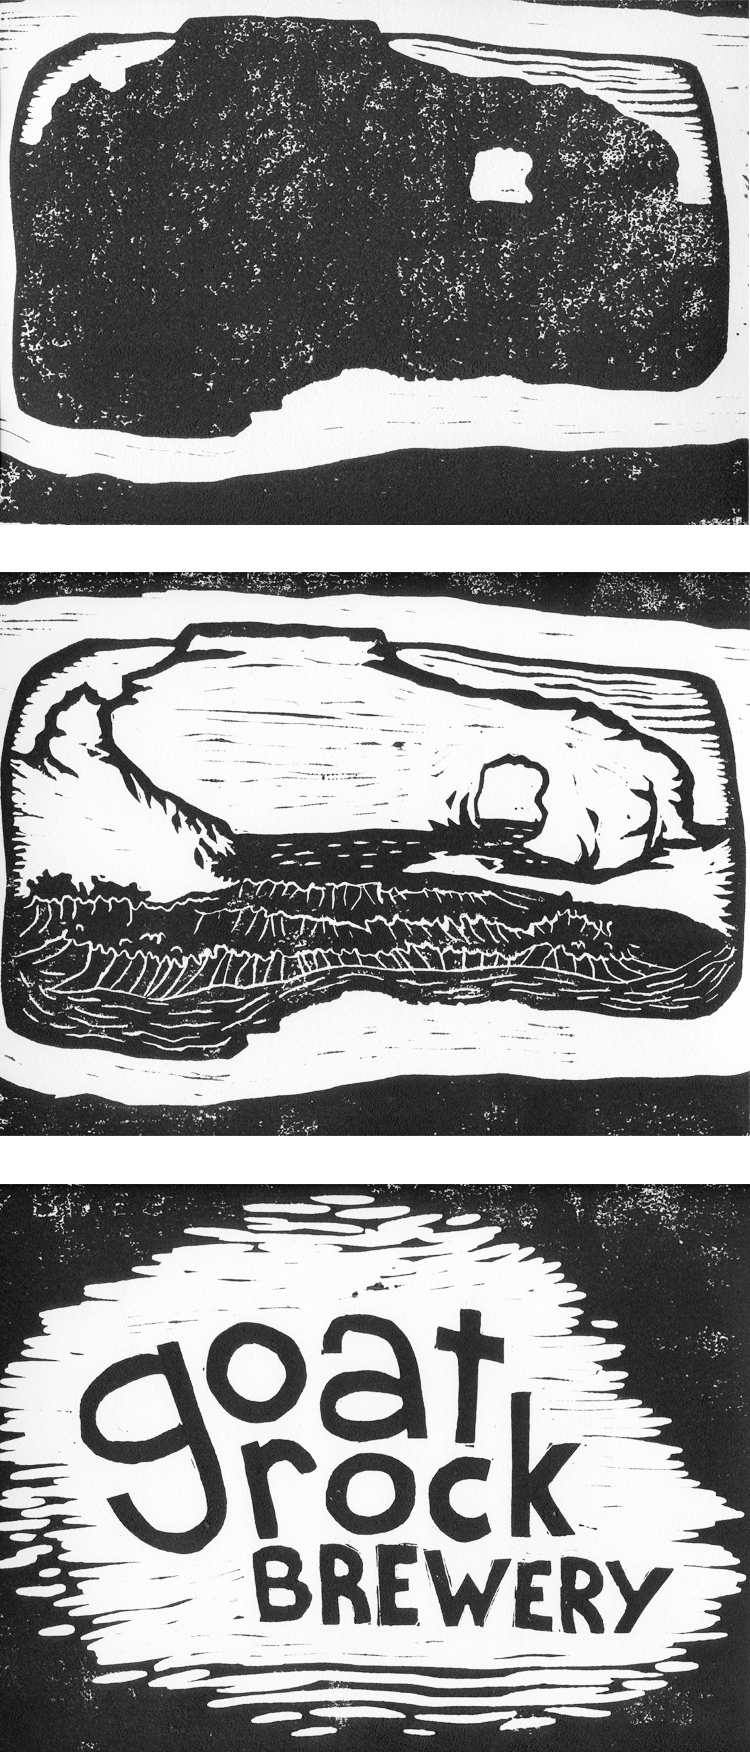 Goat-Rock-Brewery-Prints.jpg